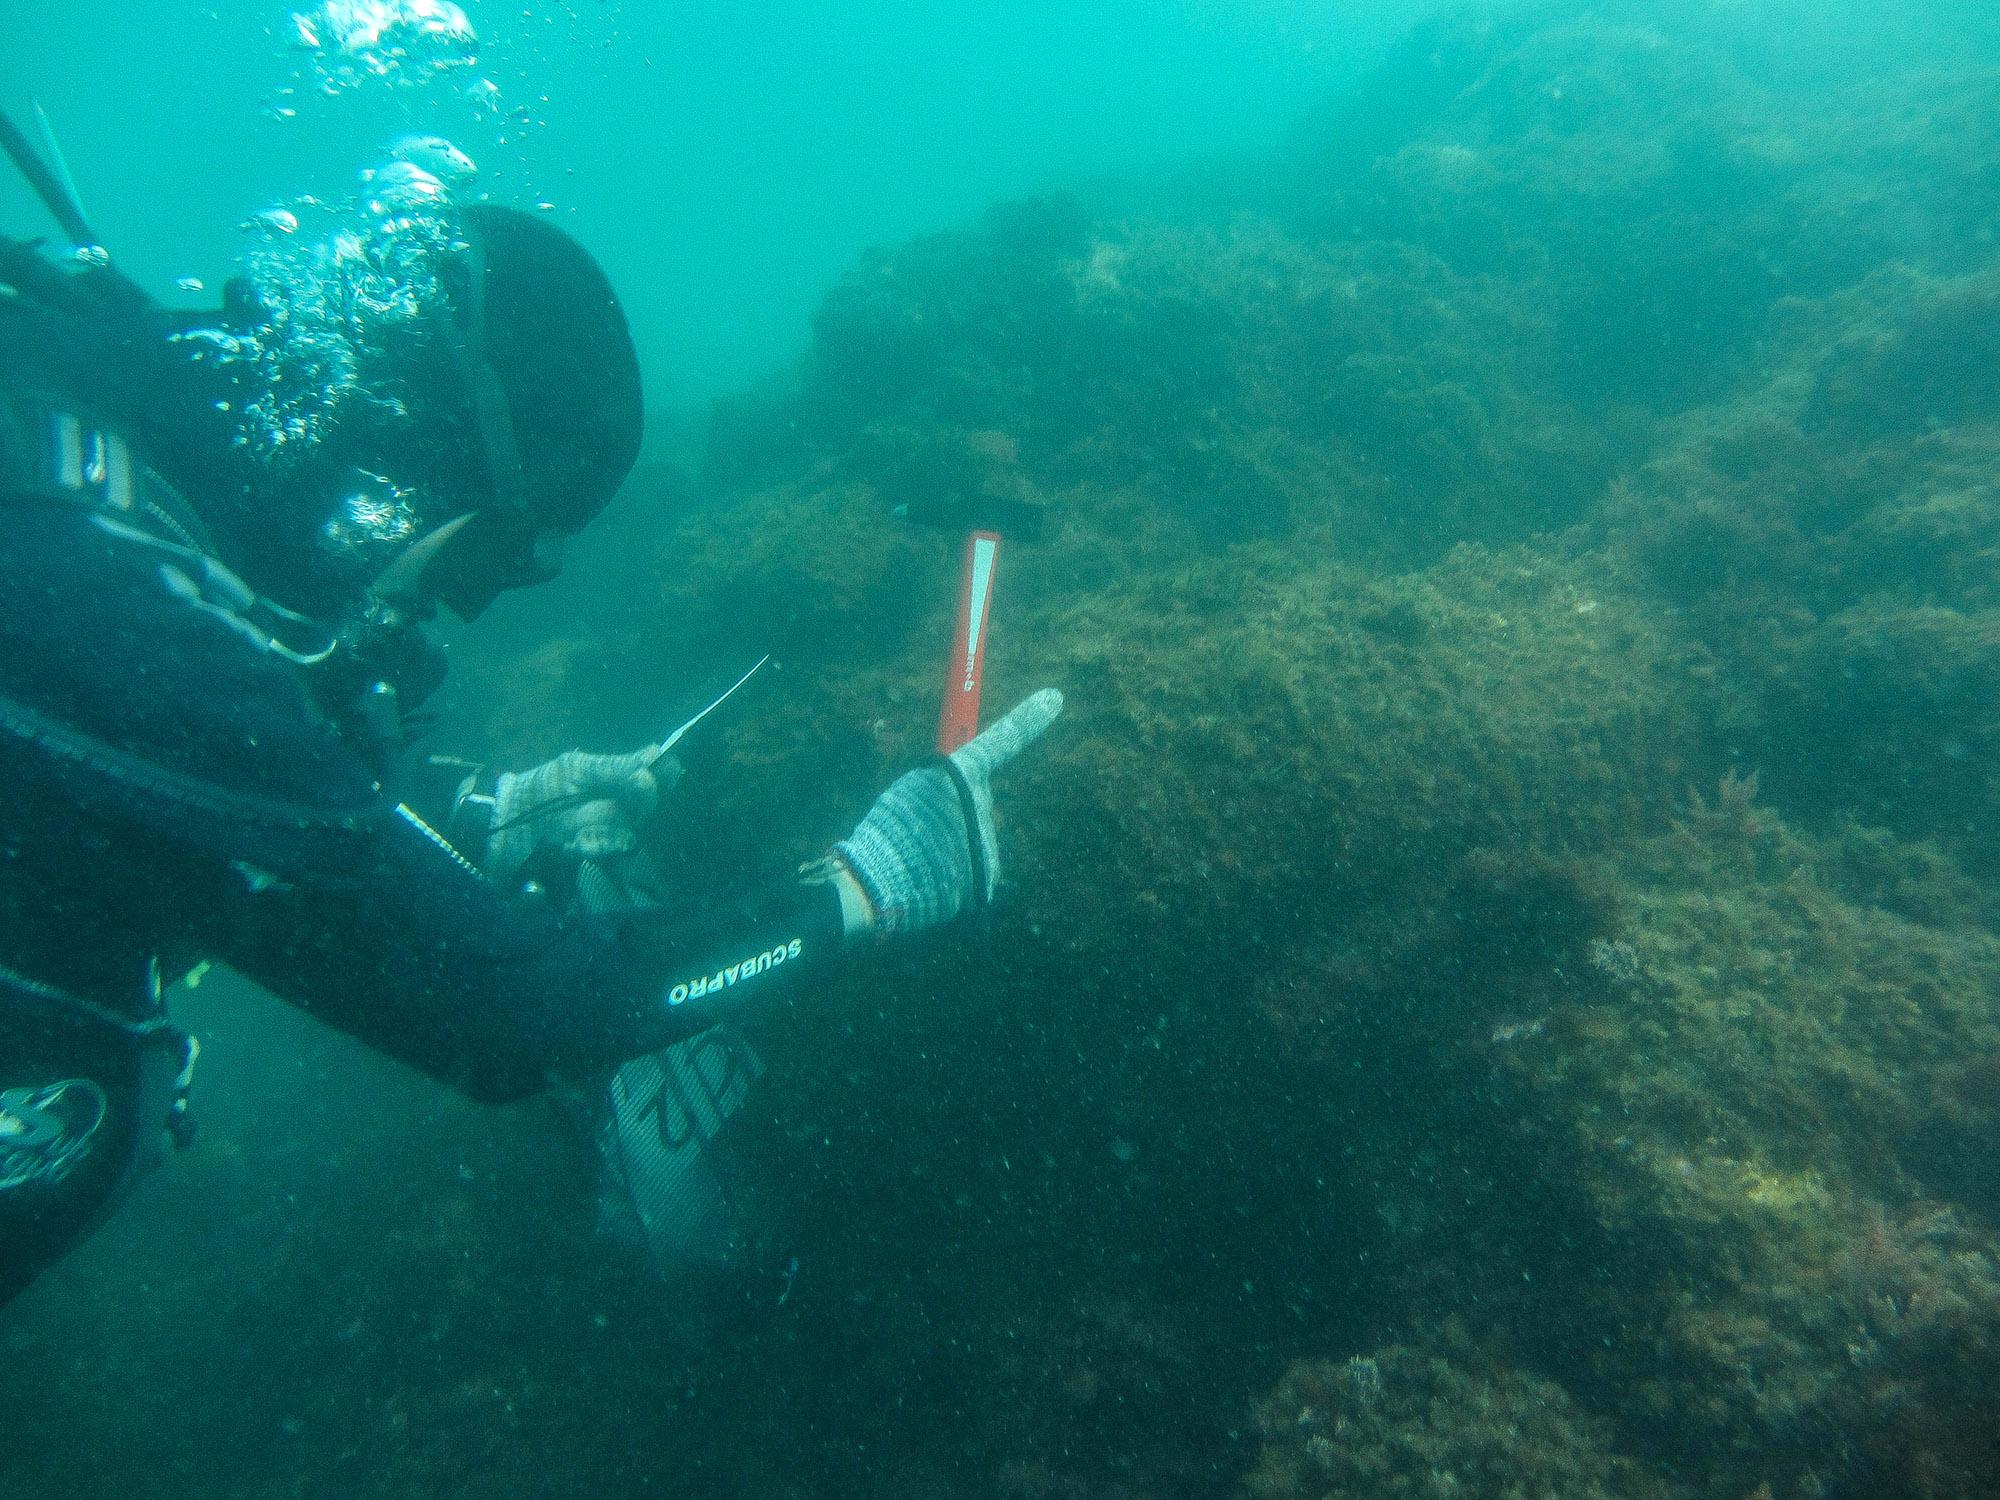 19th-Century British Shipwreck Found off French Coast